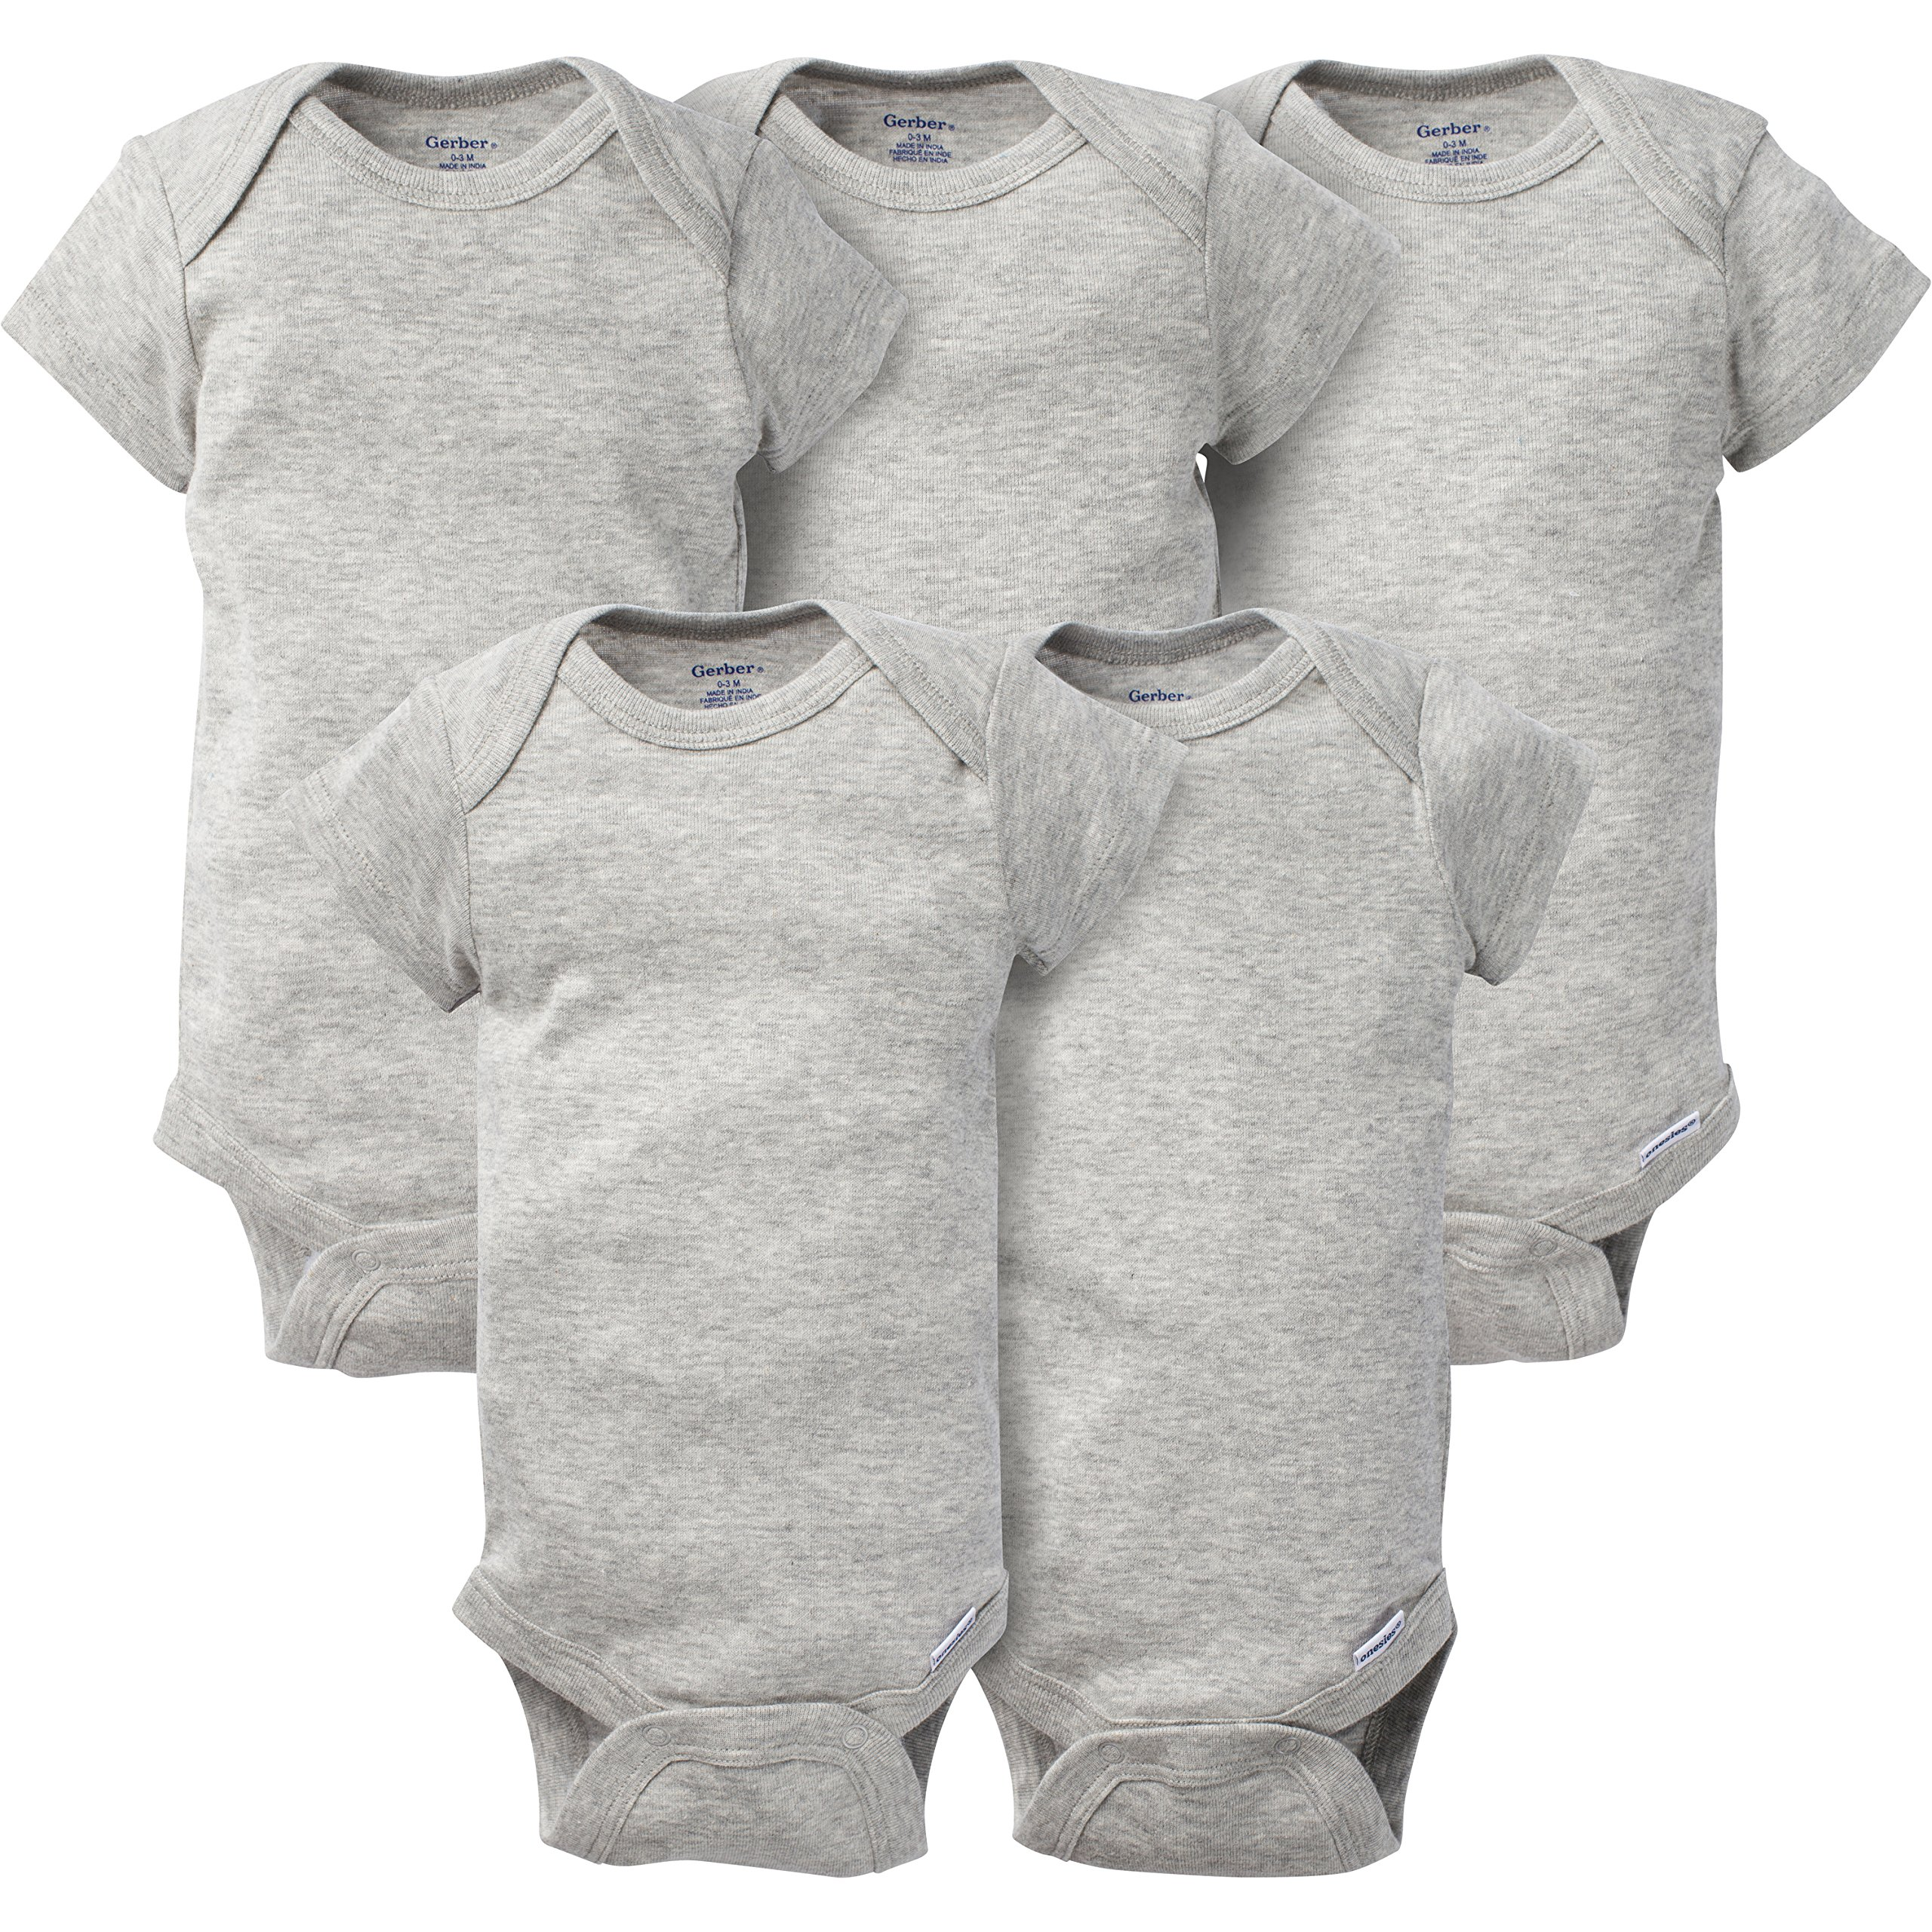 Gerber Baby 5-Pack Solid Onesies Bodysuits, Gray, 0-3 Months